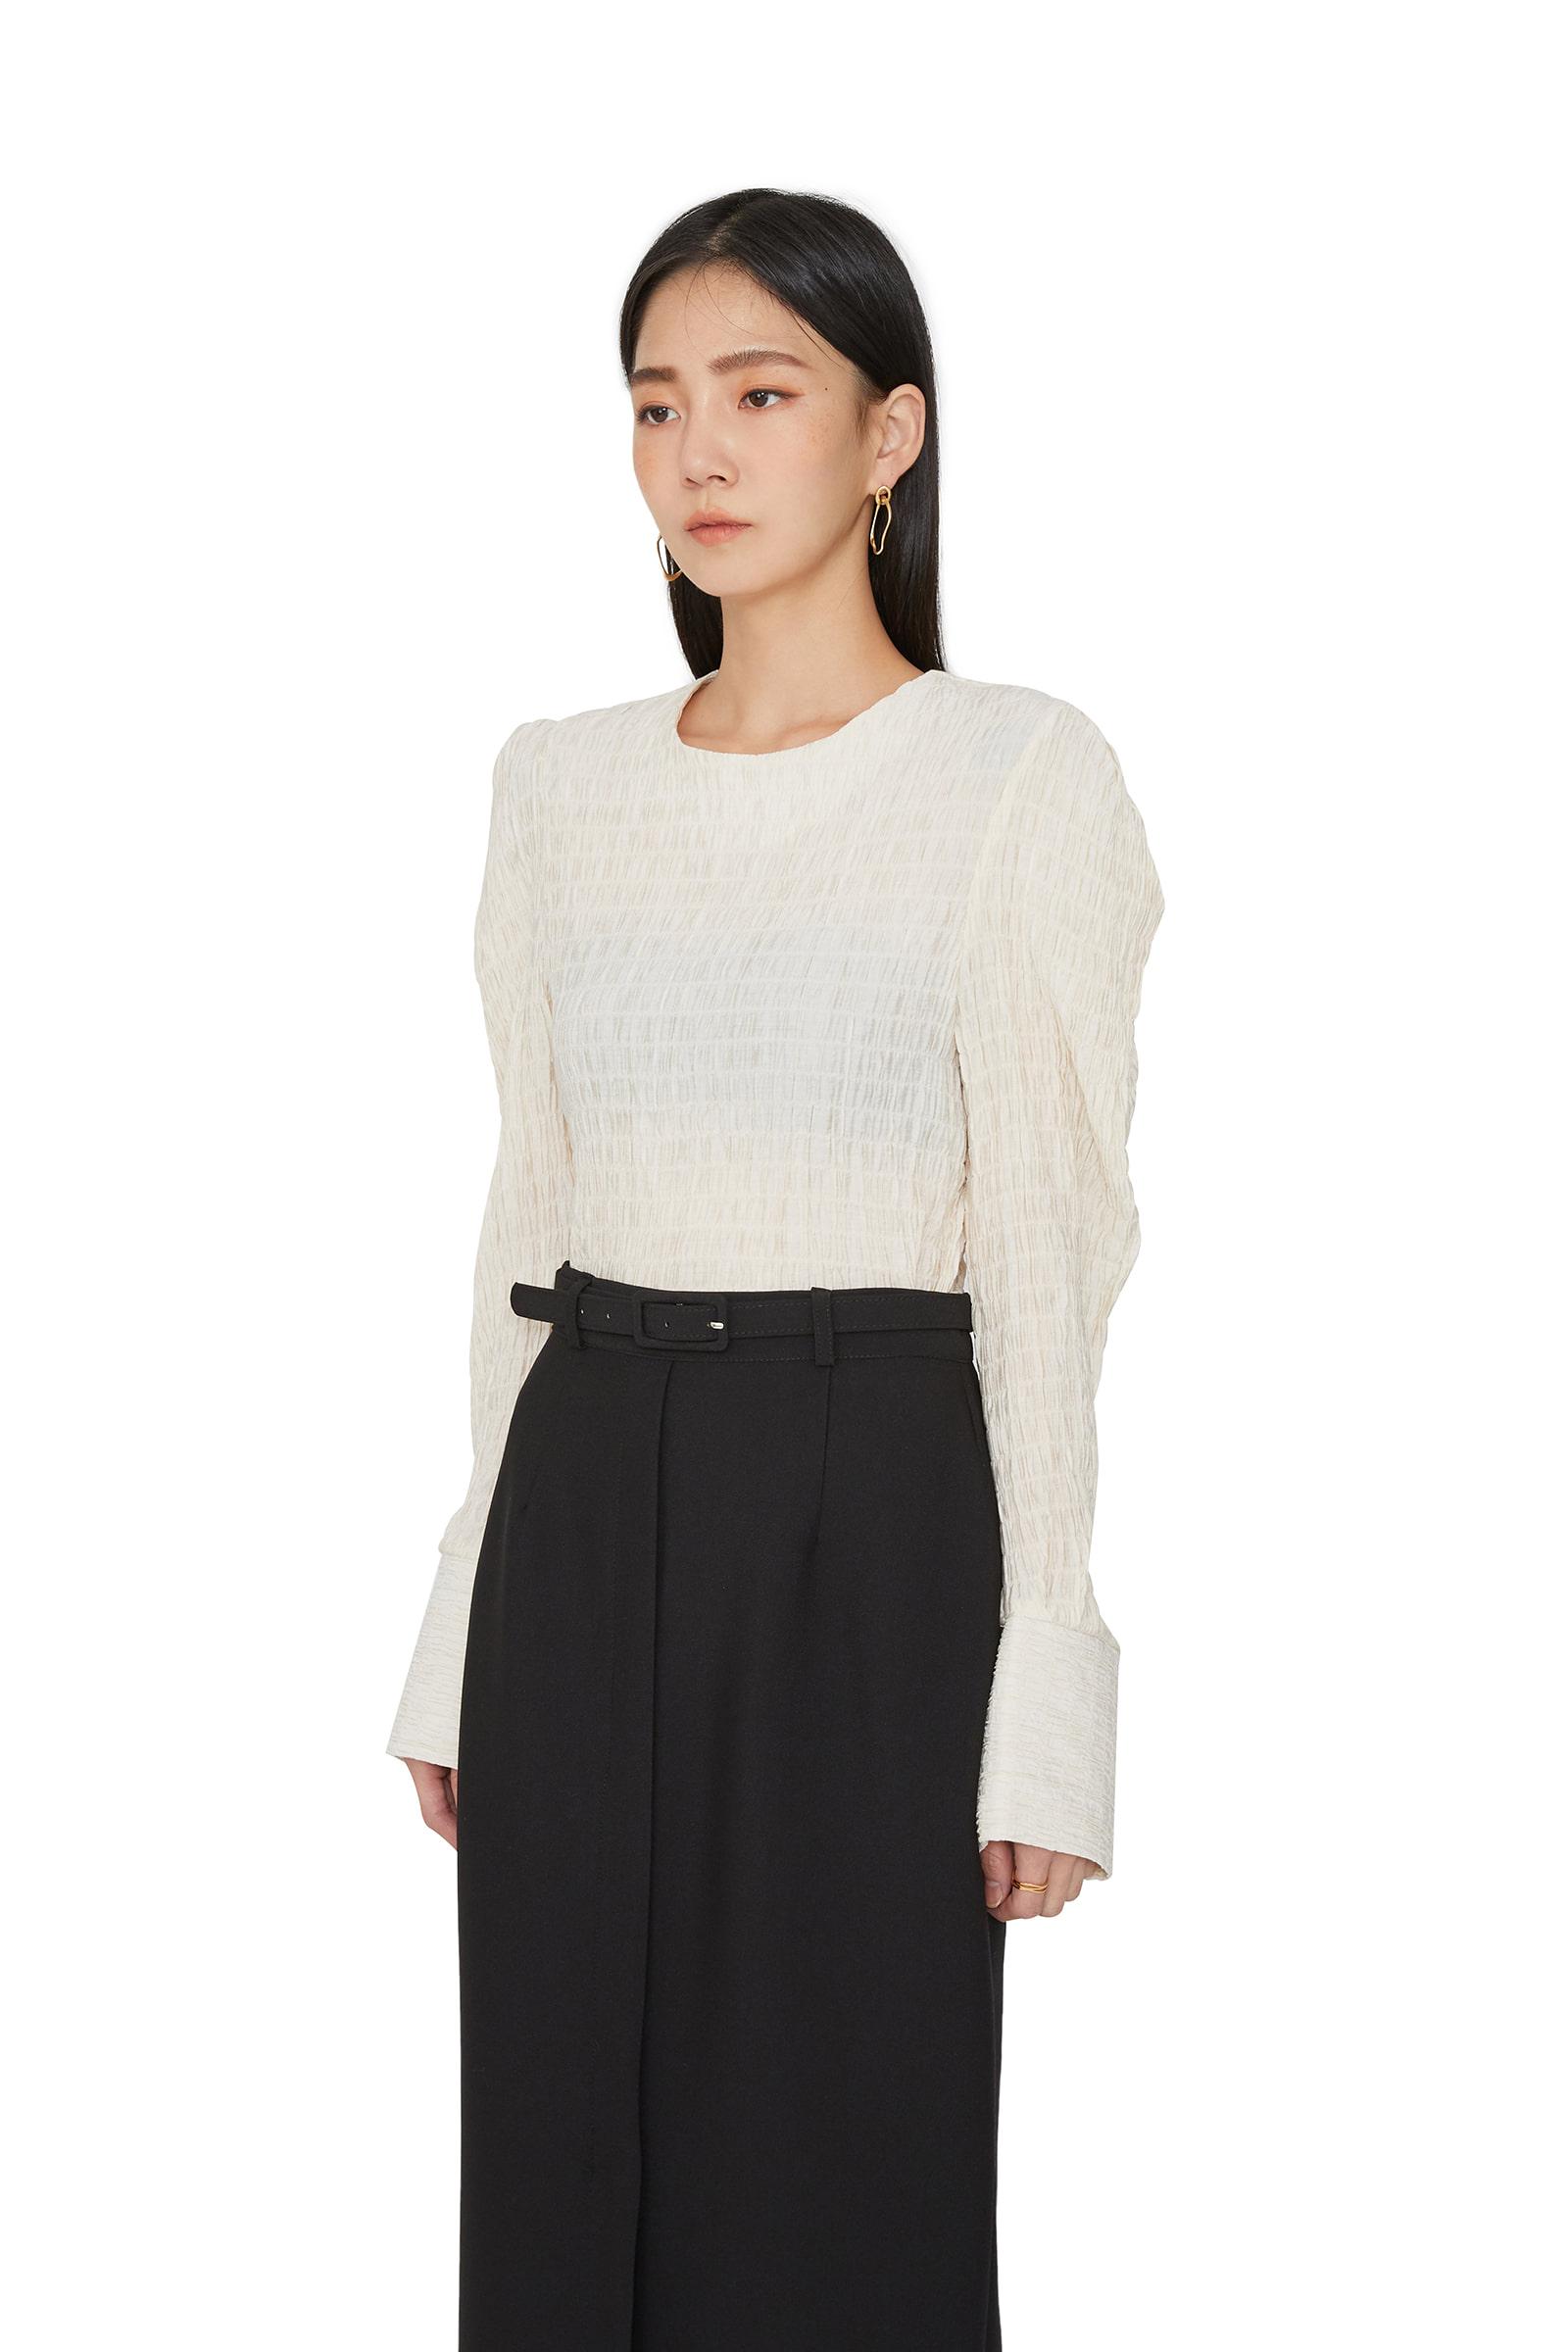 Hour crease puff blouse